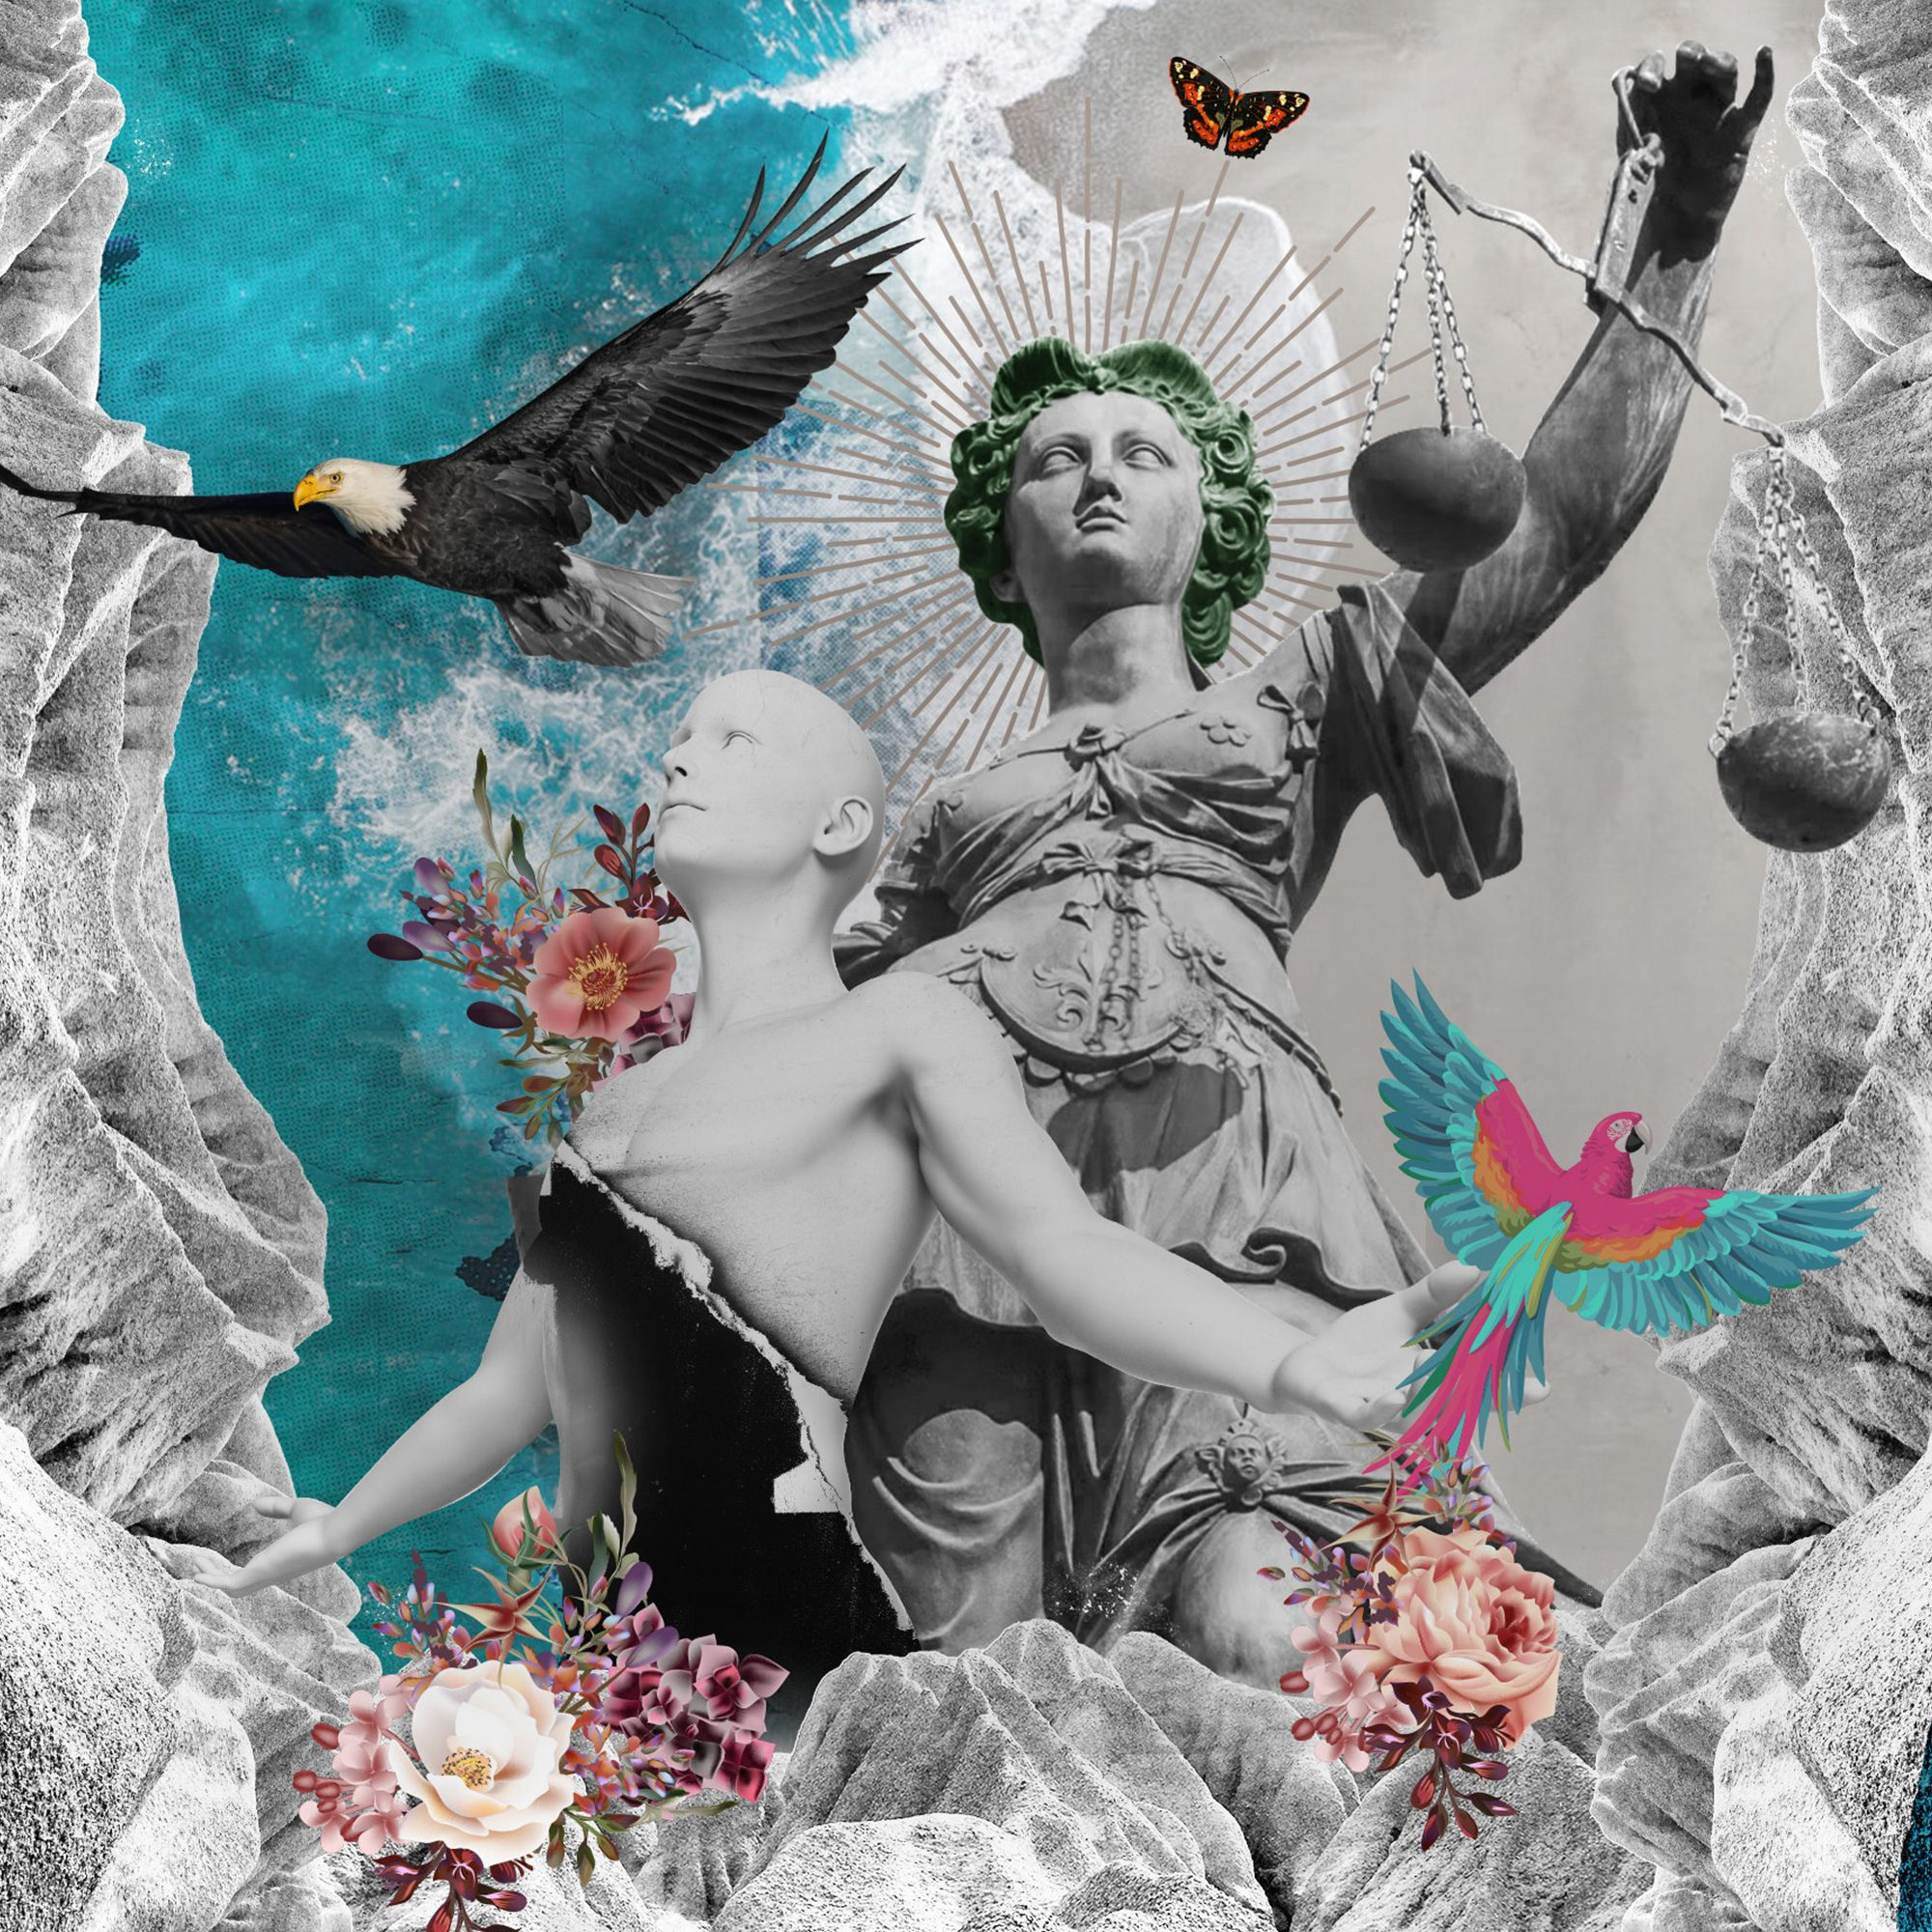 vibrant creative artwork